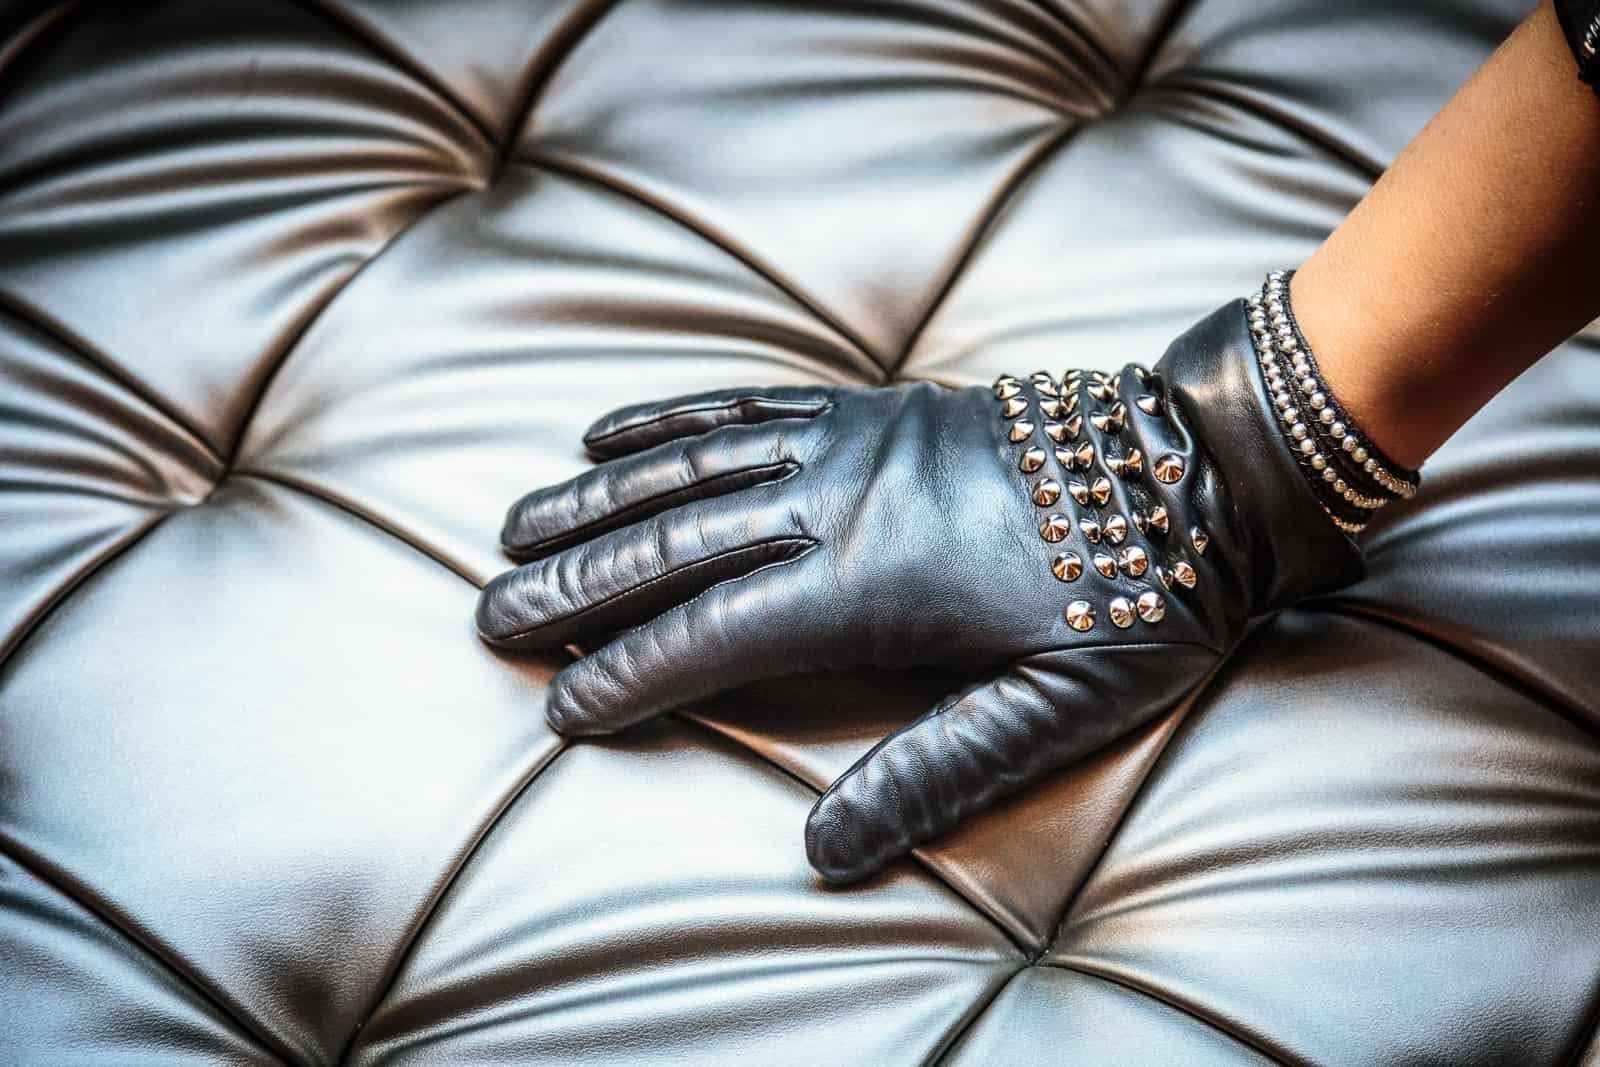 beau-gant-gloves-metal-studs-black-fashion2